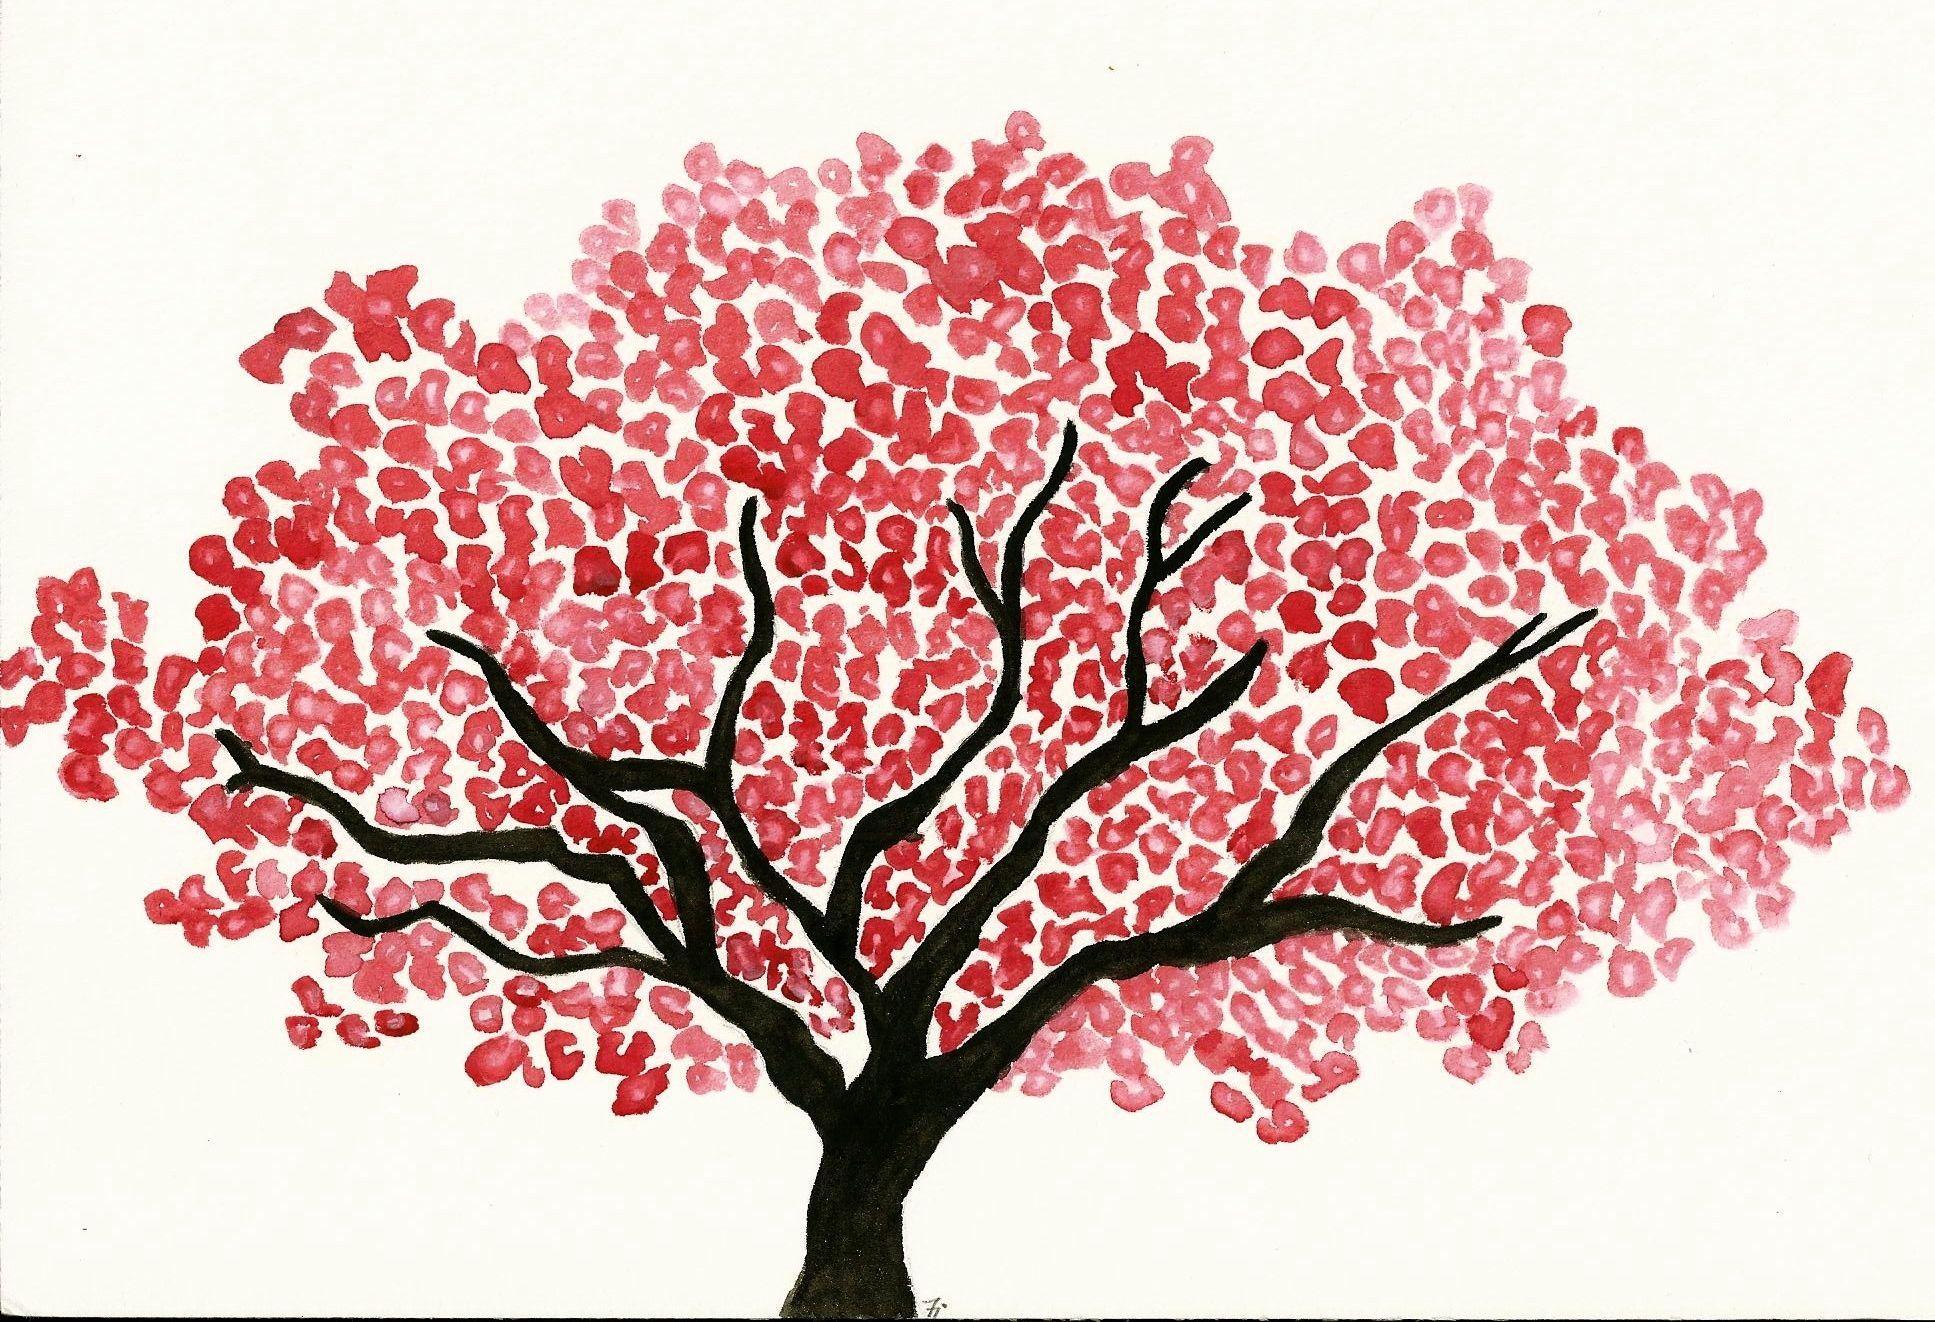 cerisier japonais l 39 aquarelle illustrations cerisier. Black Bedroom Furniture Sets. Home Design Ideas